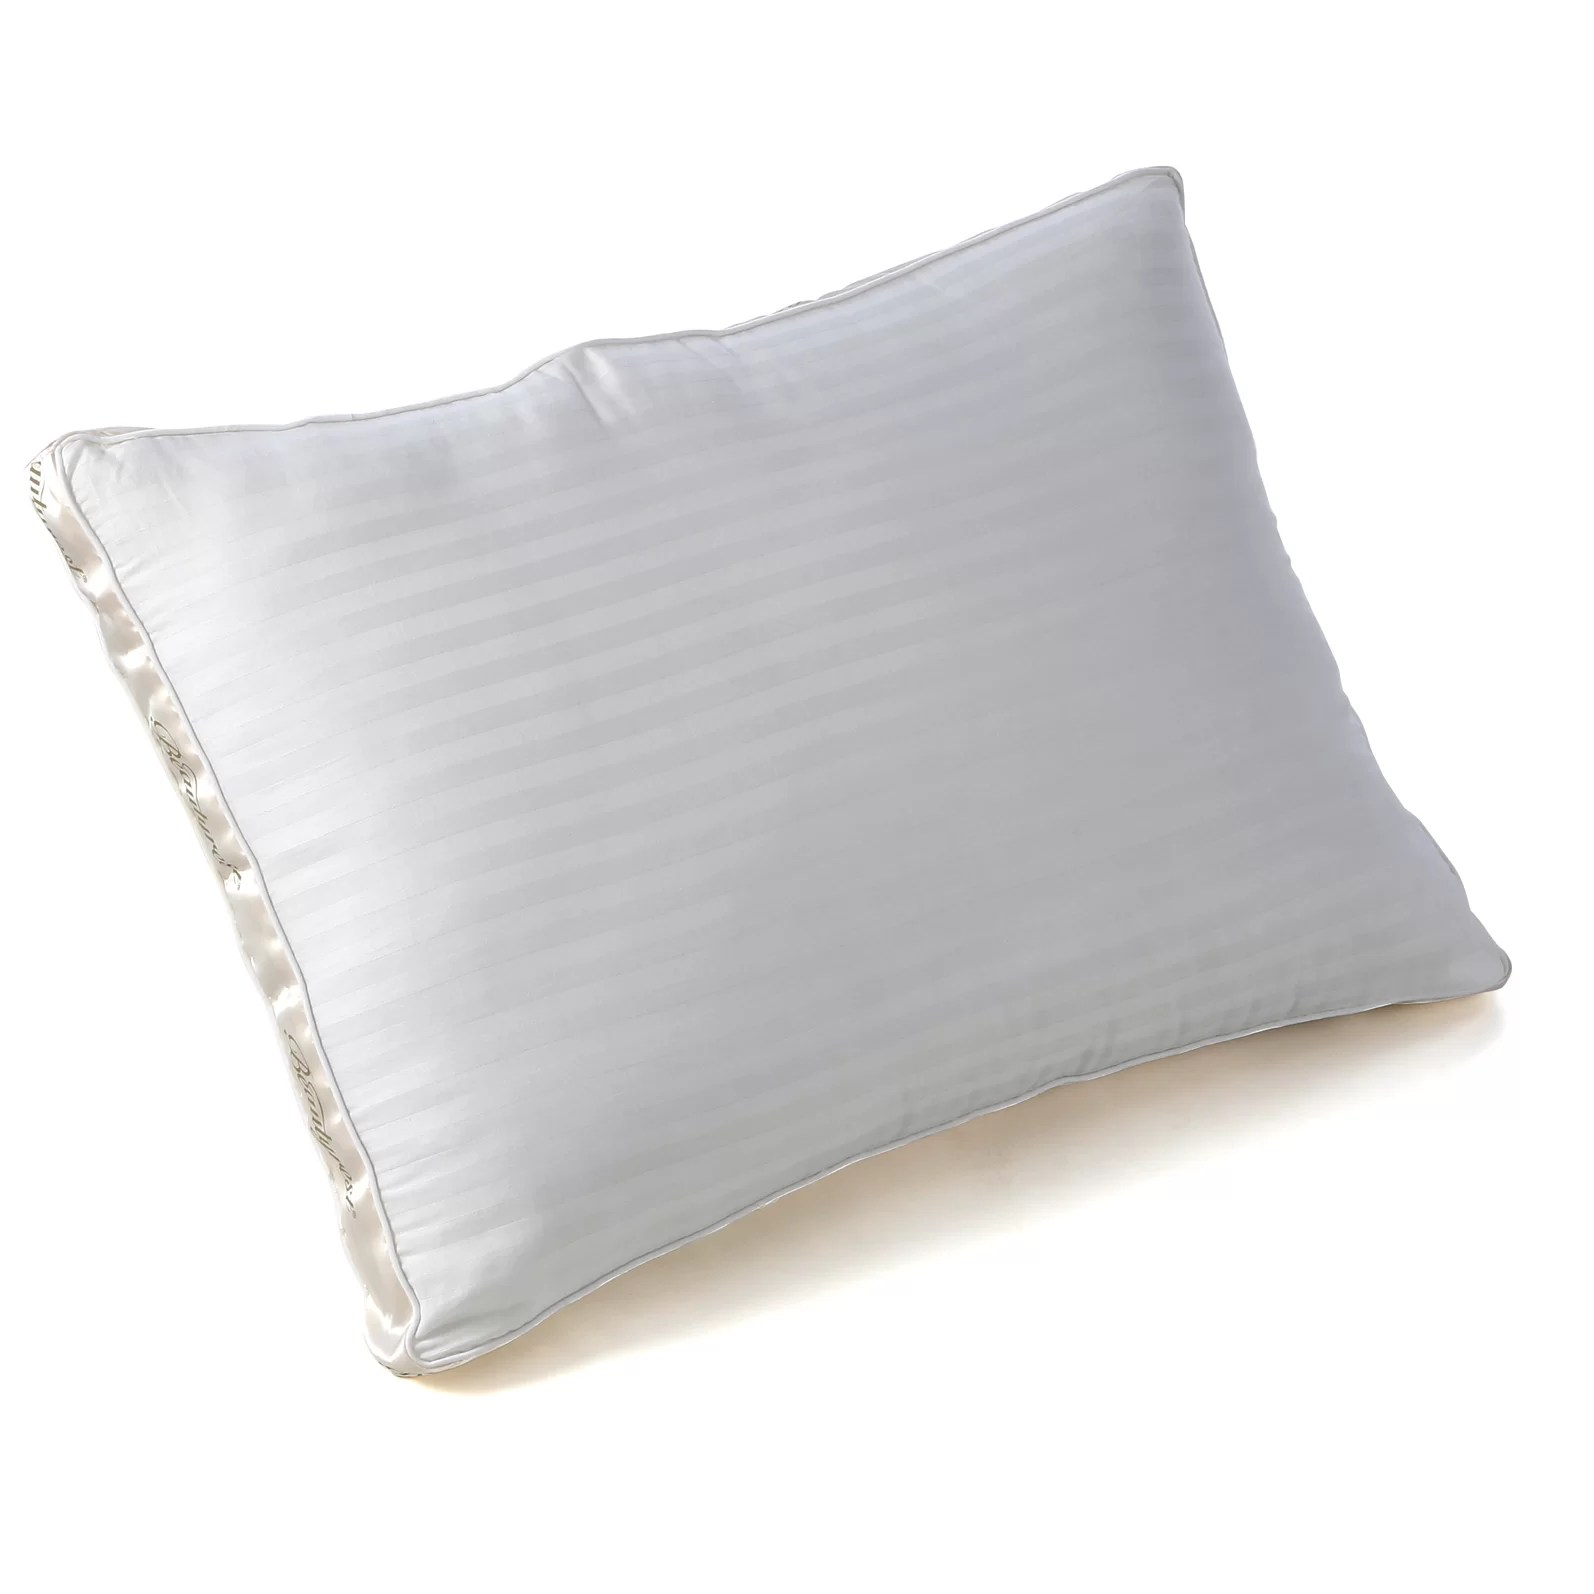 Simmons Beautyrest Pima Cotton Extra Firm Pillow  Reviews